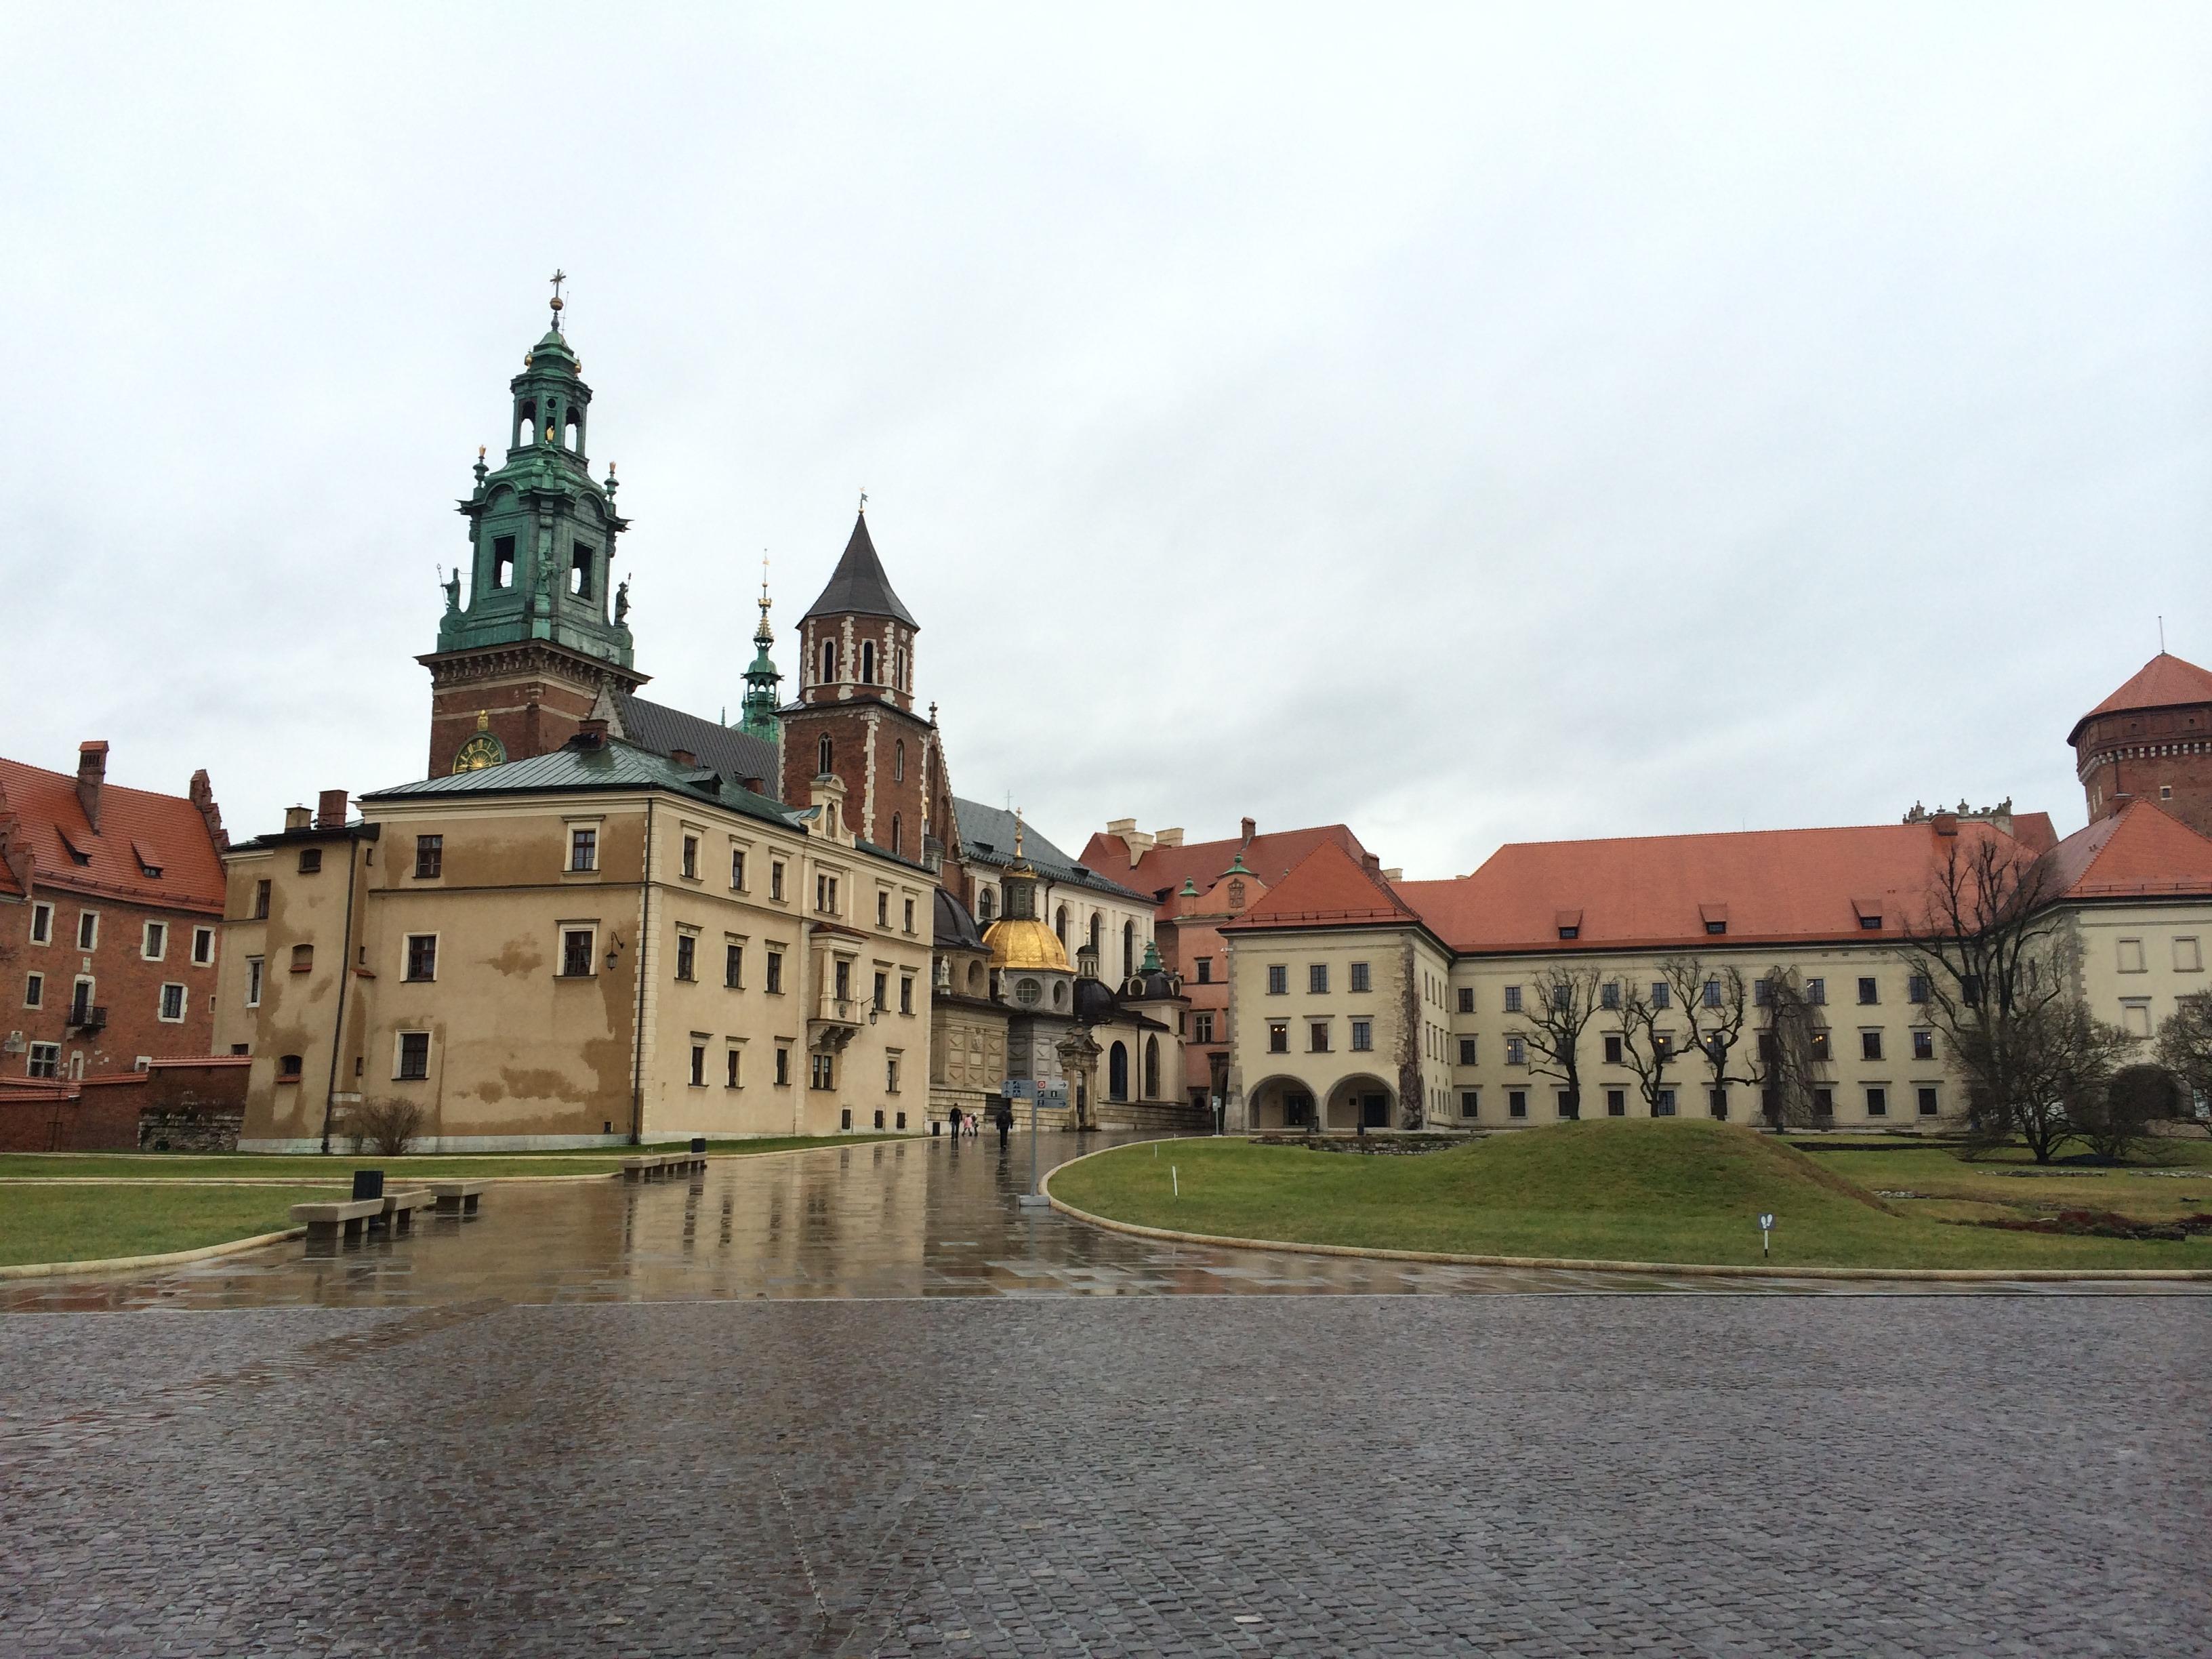 A Catedral de Wawel. (Foto: Nathalia Tavolieri)